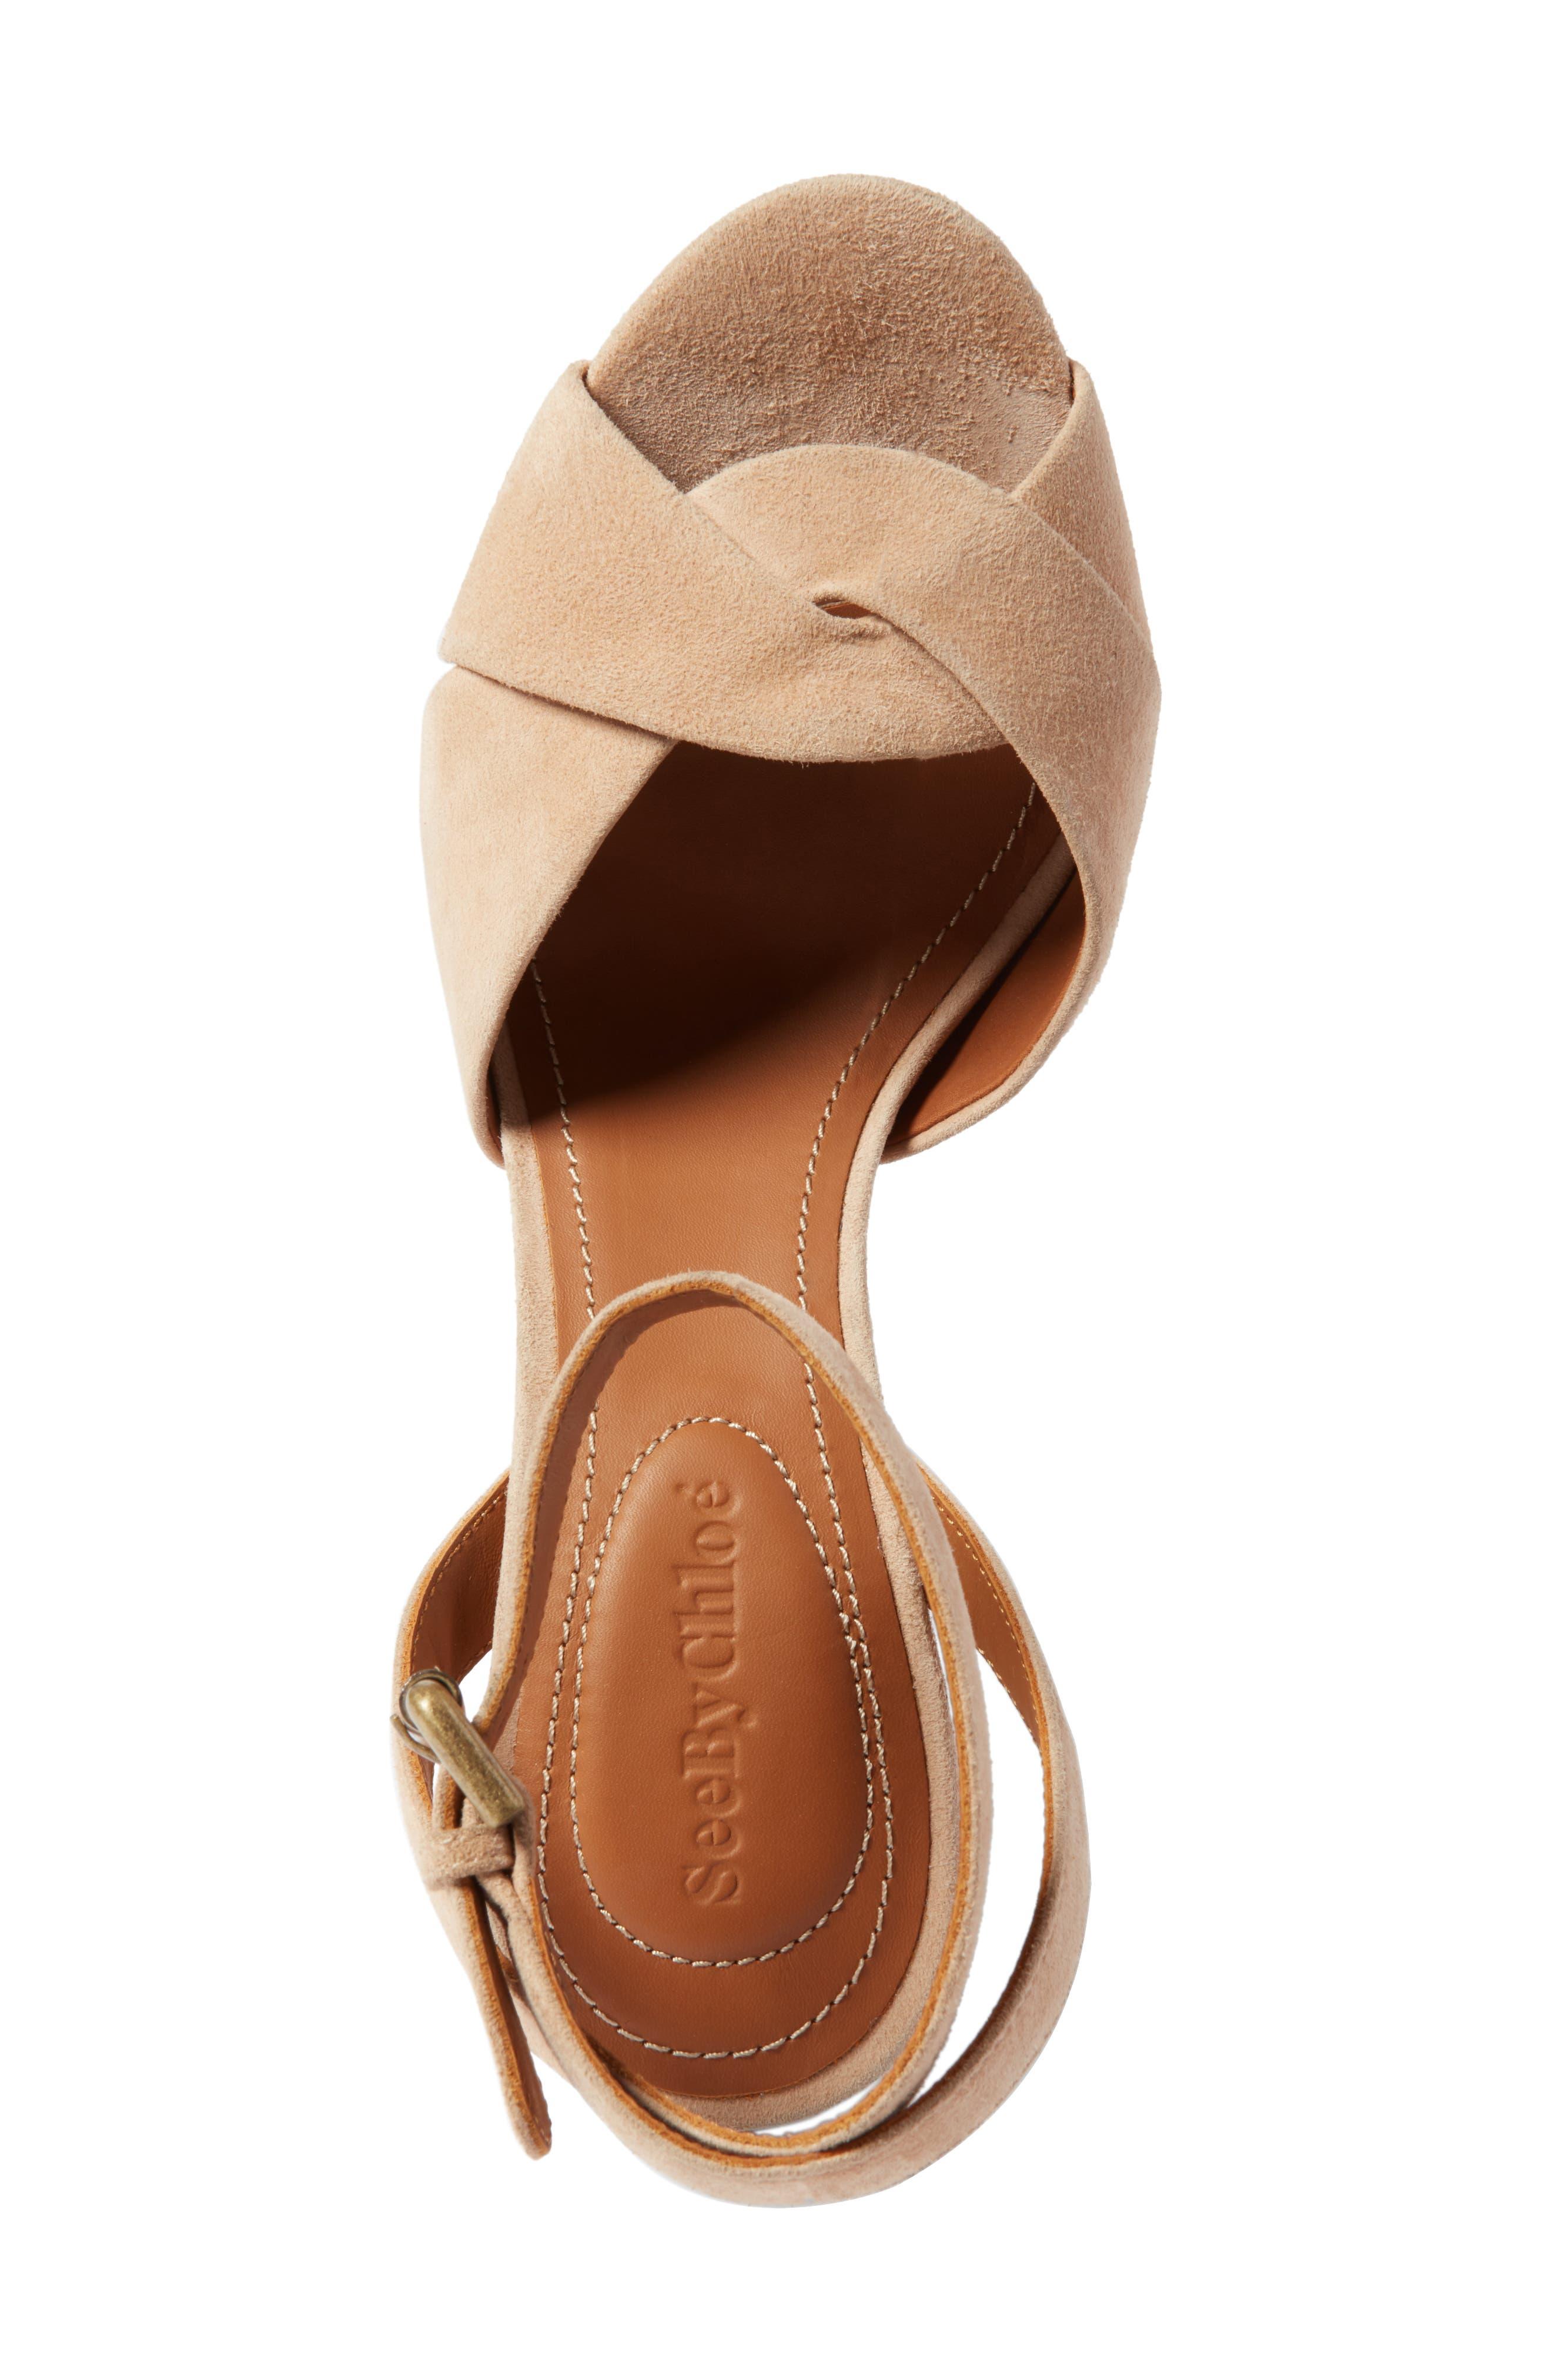 Gayla Embroidered Block Heel Sandal,                             Alternate thumbnail 5, color,                             250